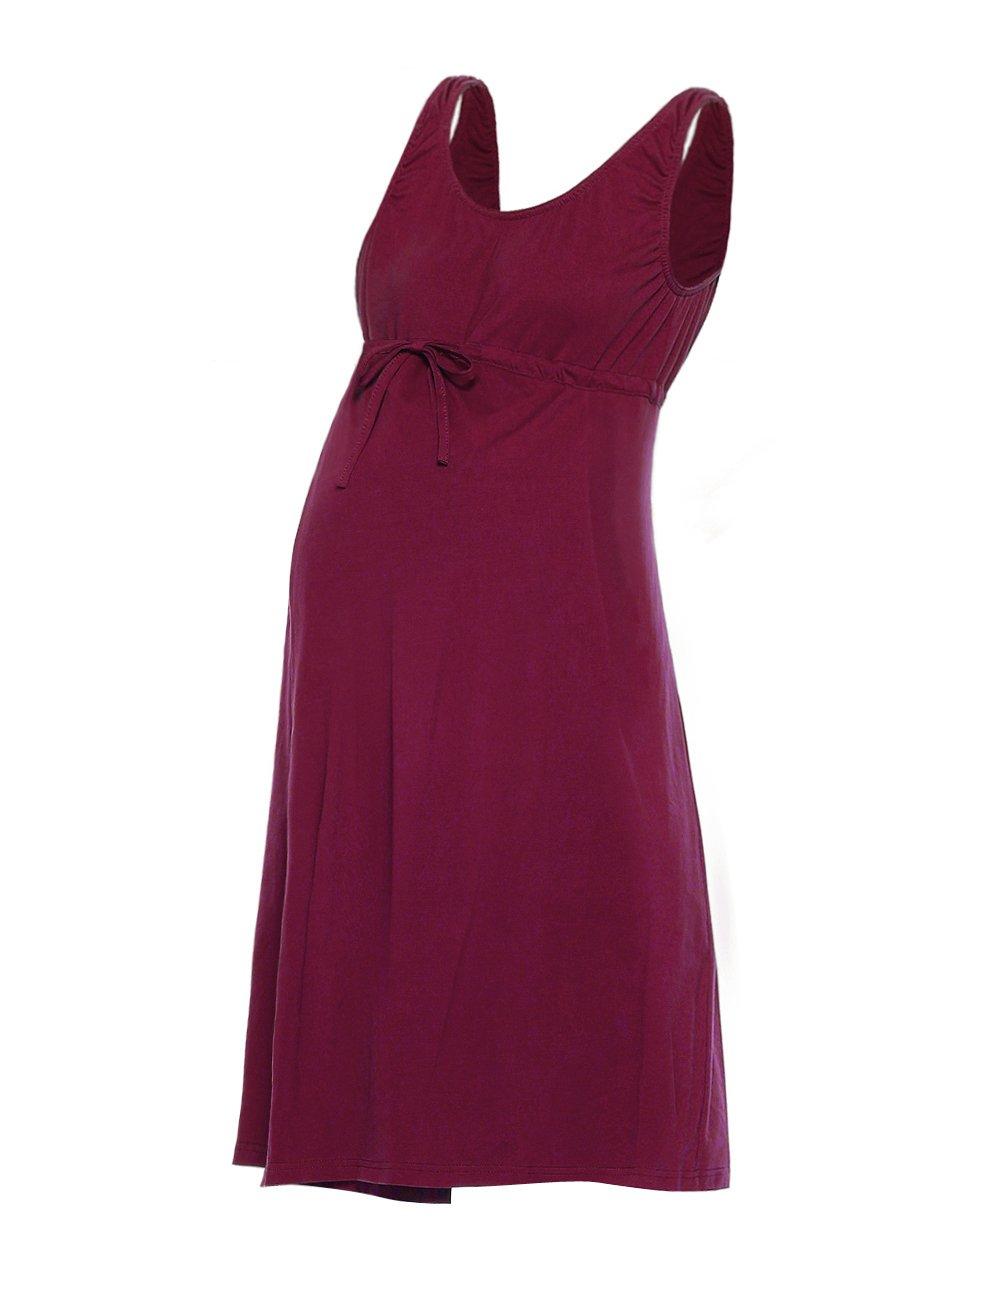 Saifeier Pj Plus Size Lightweight Nursing Nightdress Robe Labour